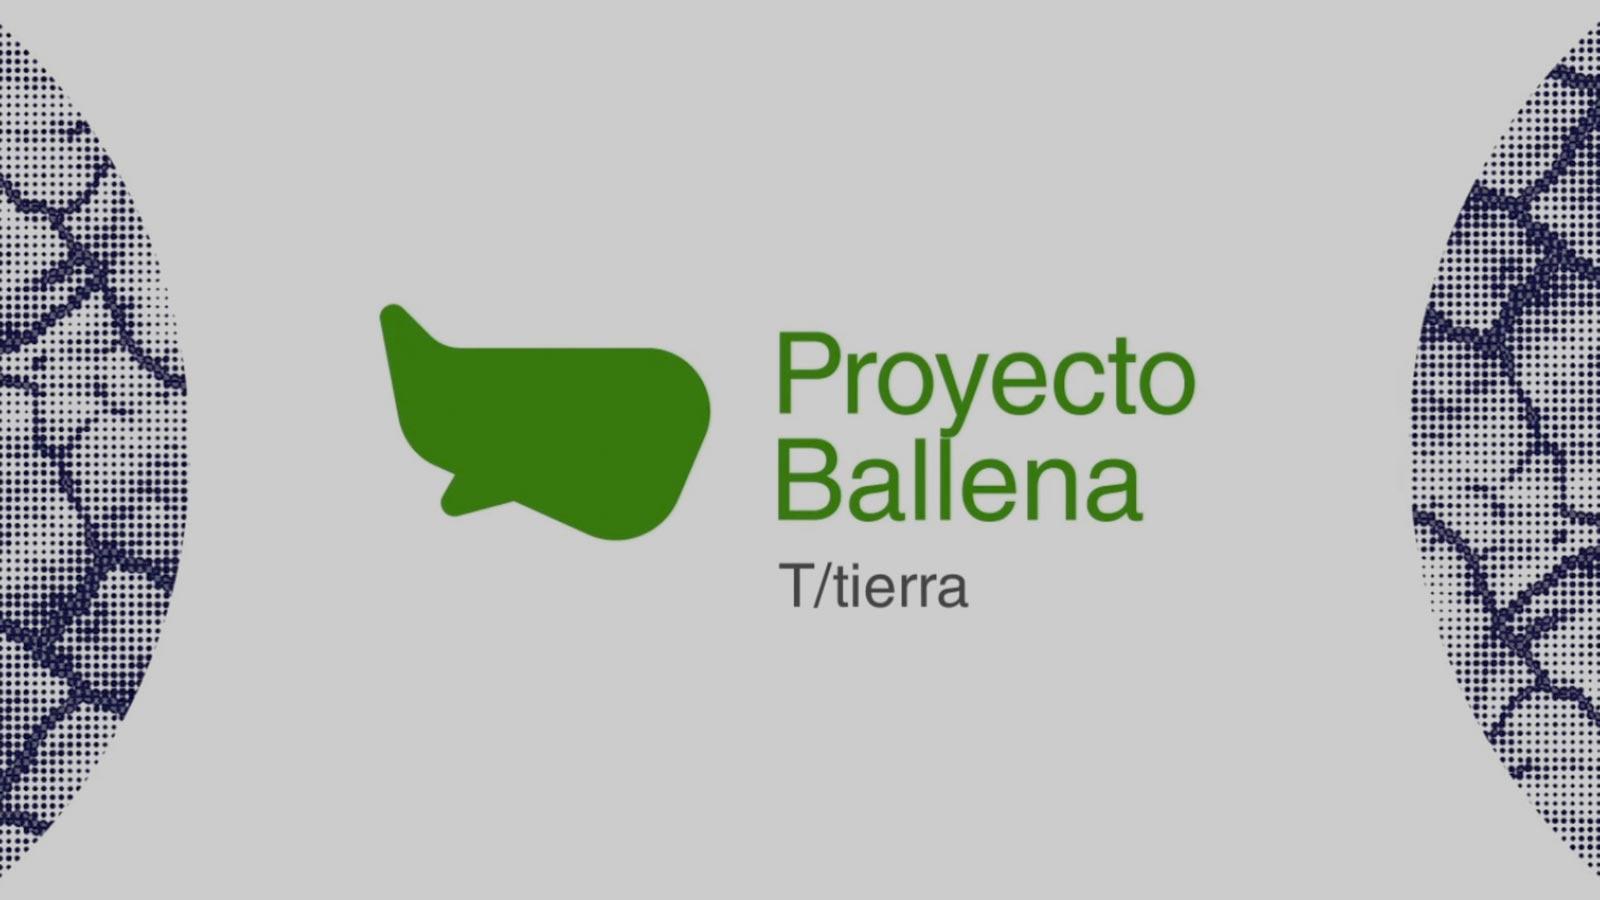 protecto-ballena-cultura